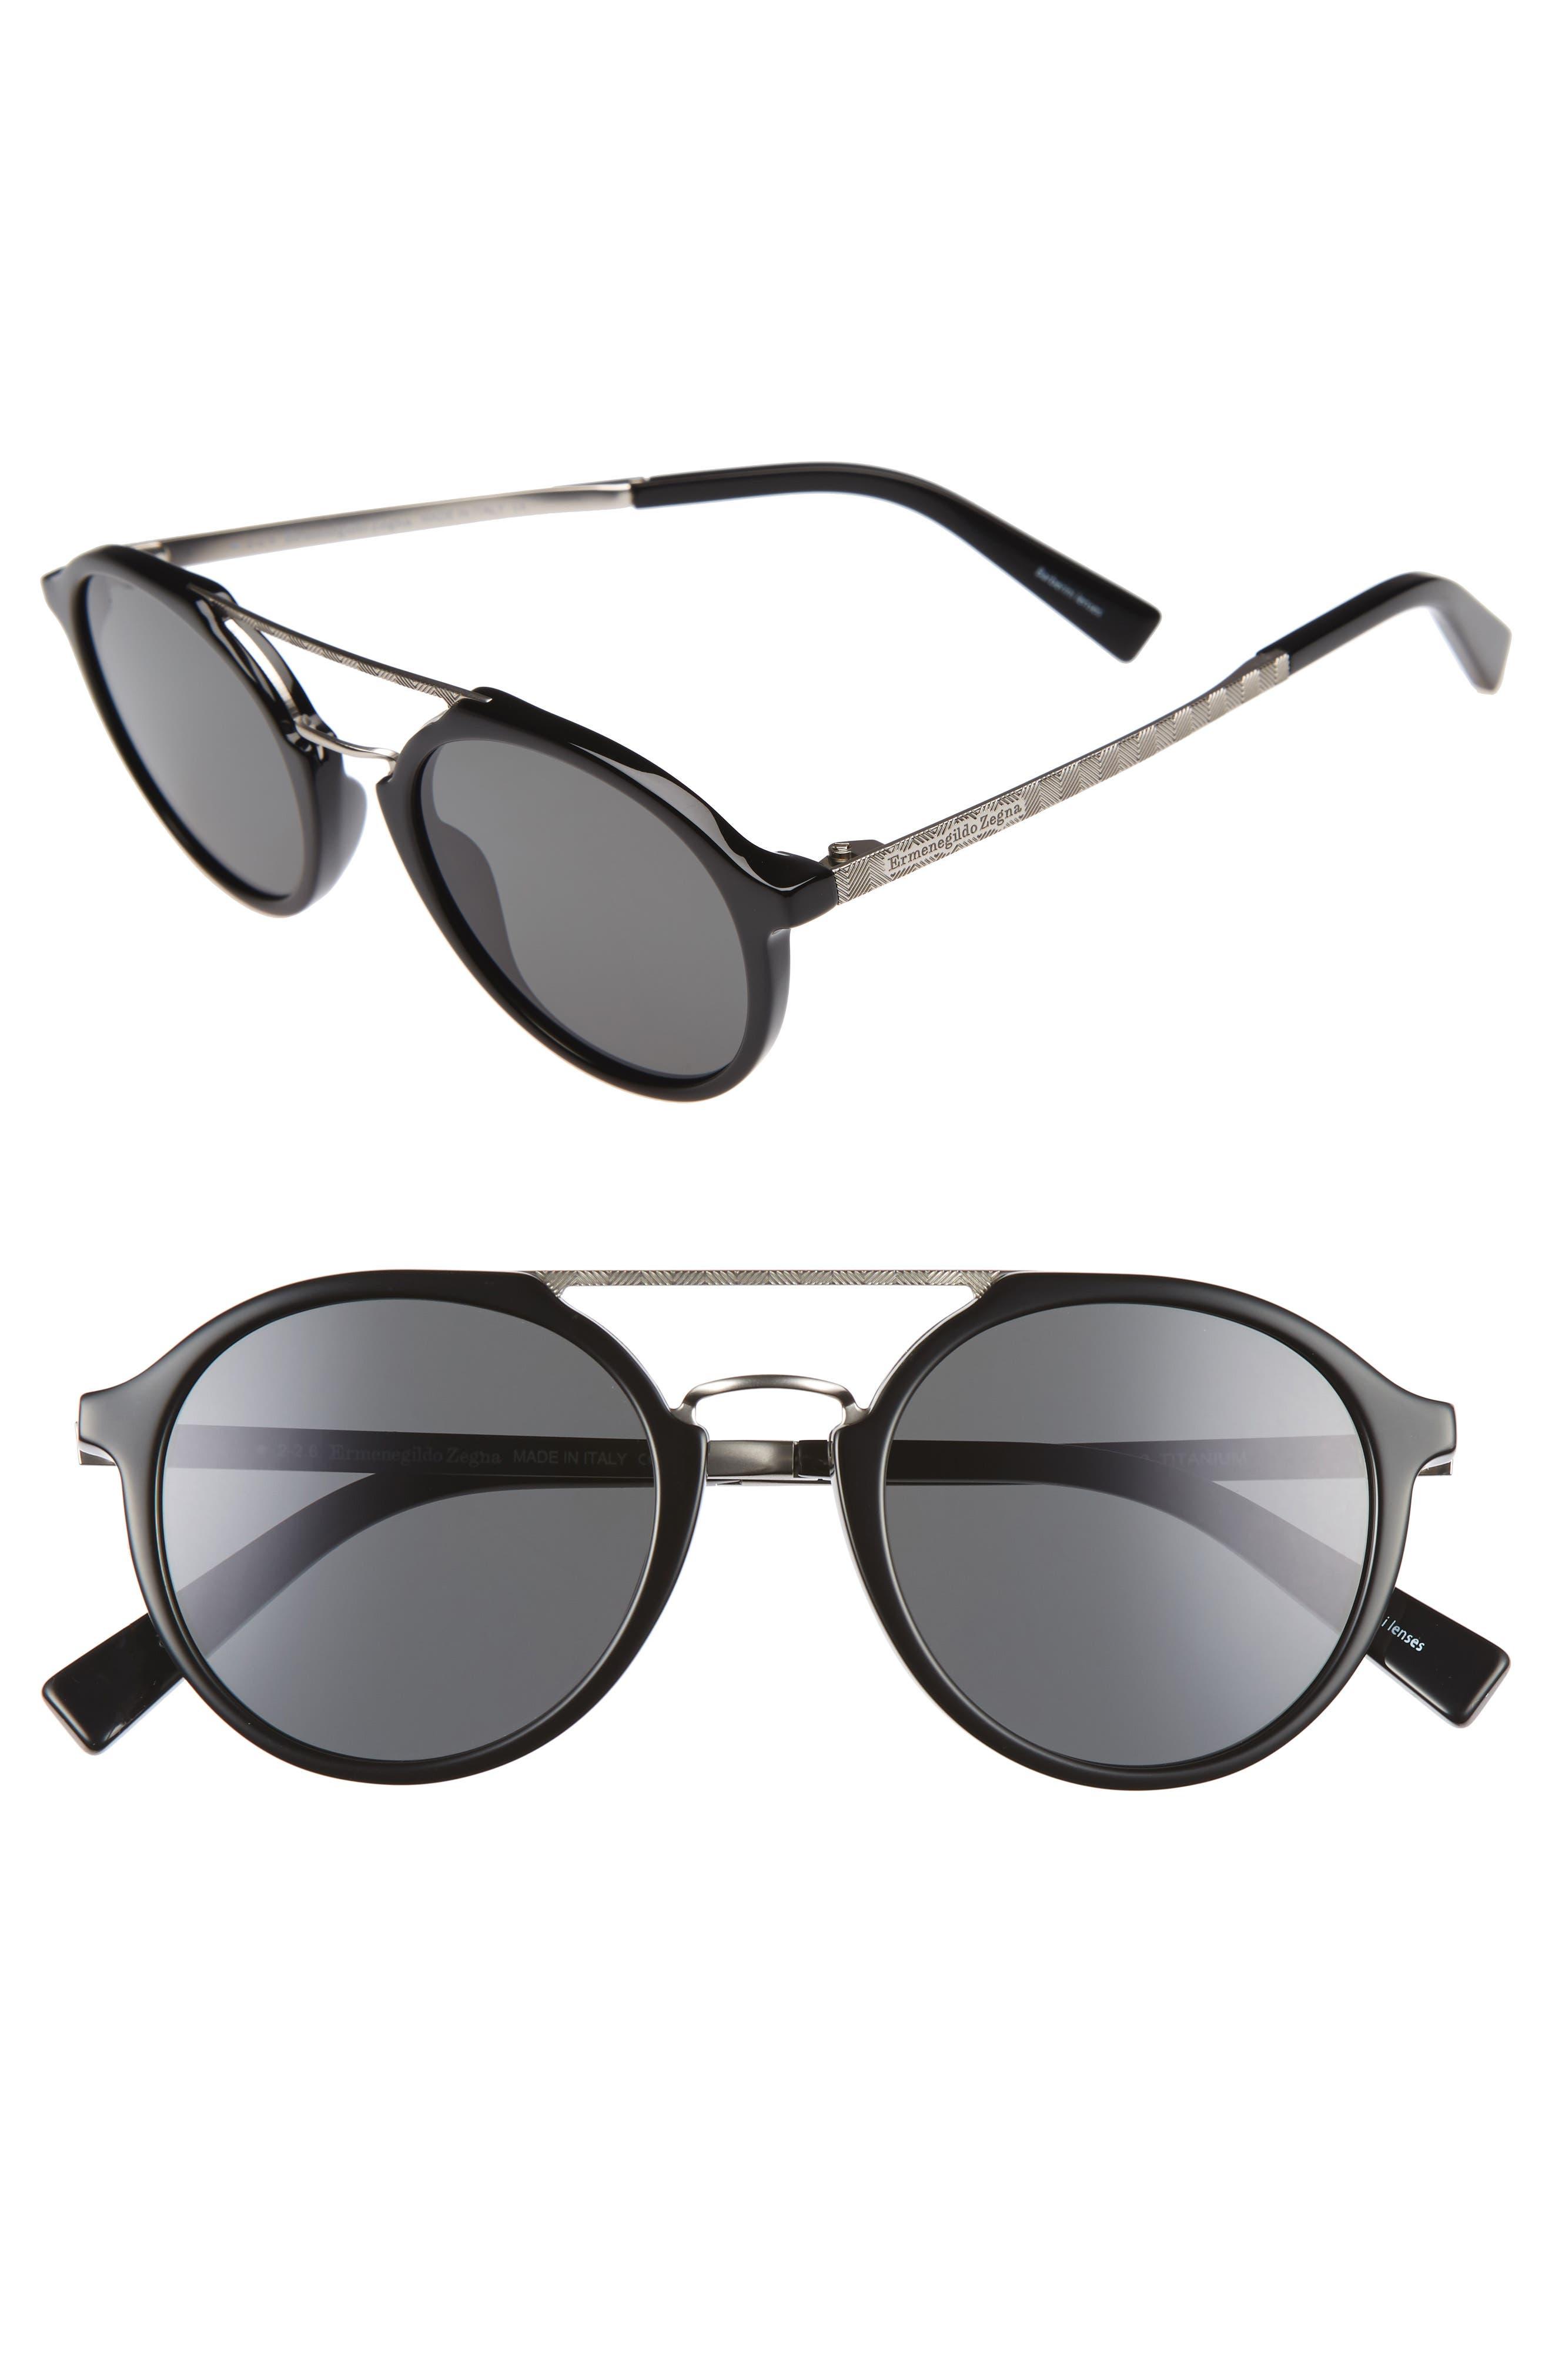 Retro 50mm Sunglasses,                             Main thumbnail 1, color,                             018